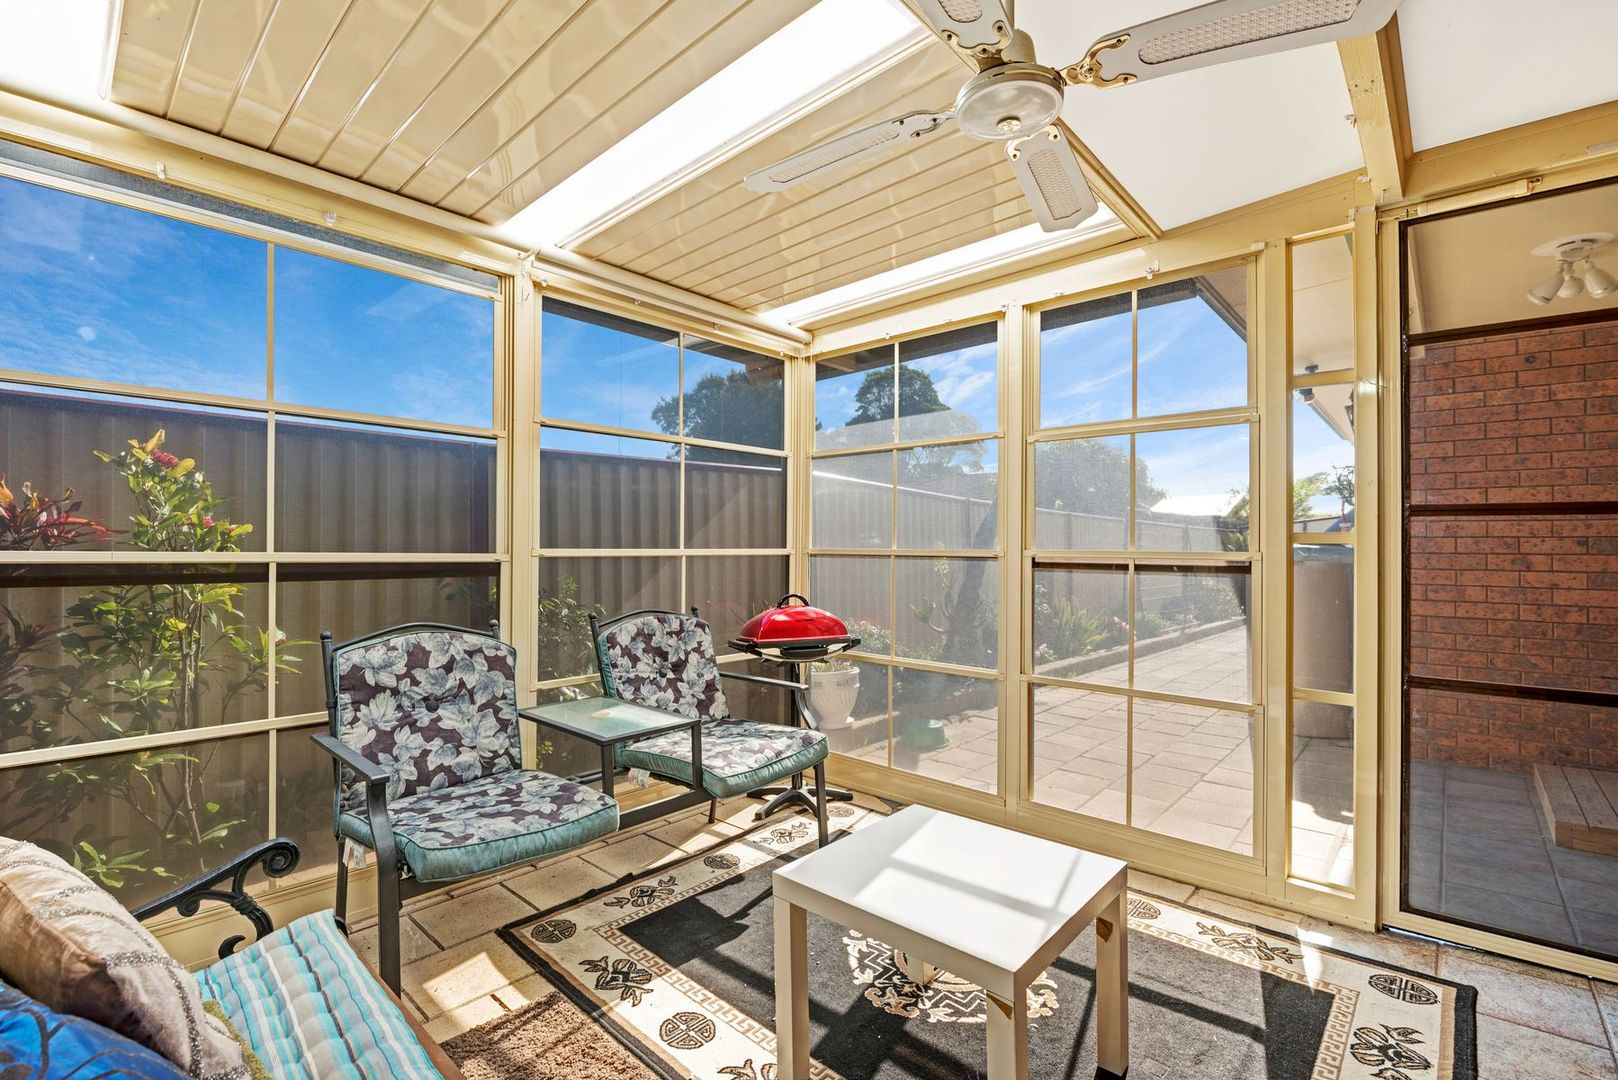 5/6-8 Centennial Avenue, Long Jetty NSW 2261, Image 2